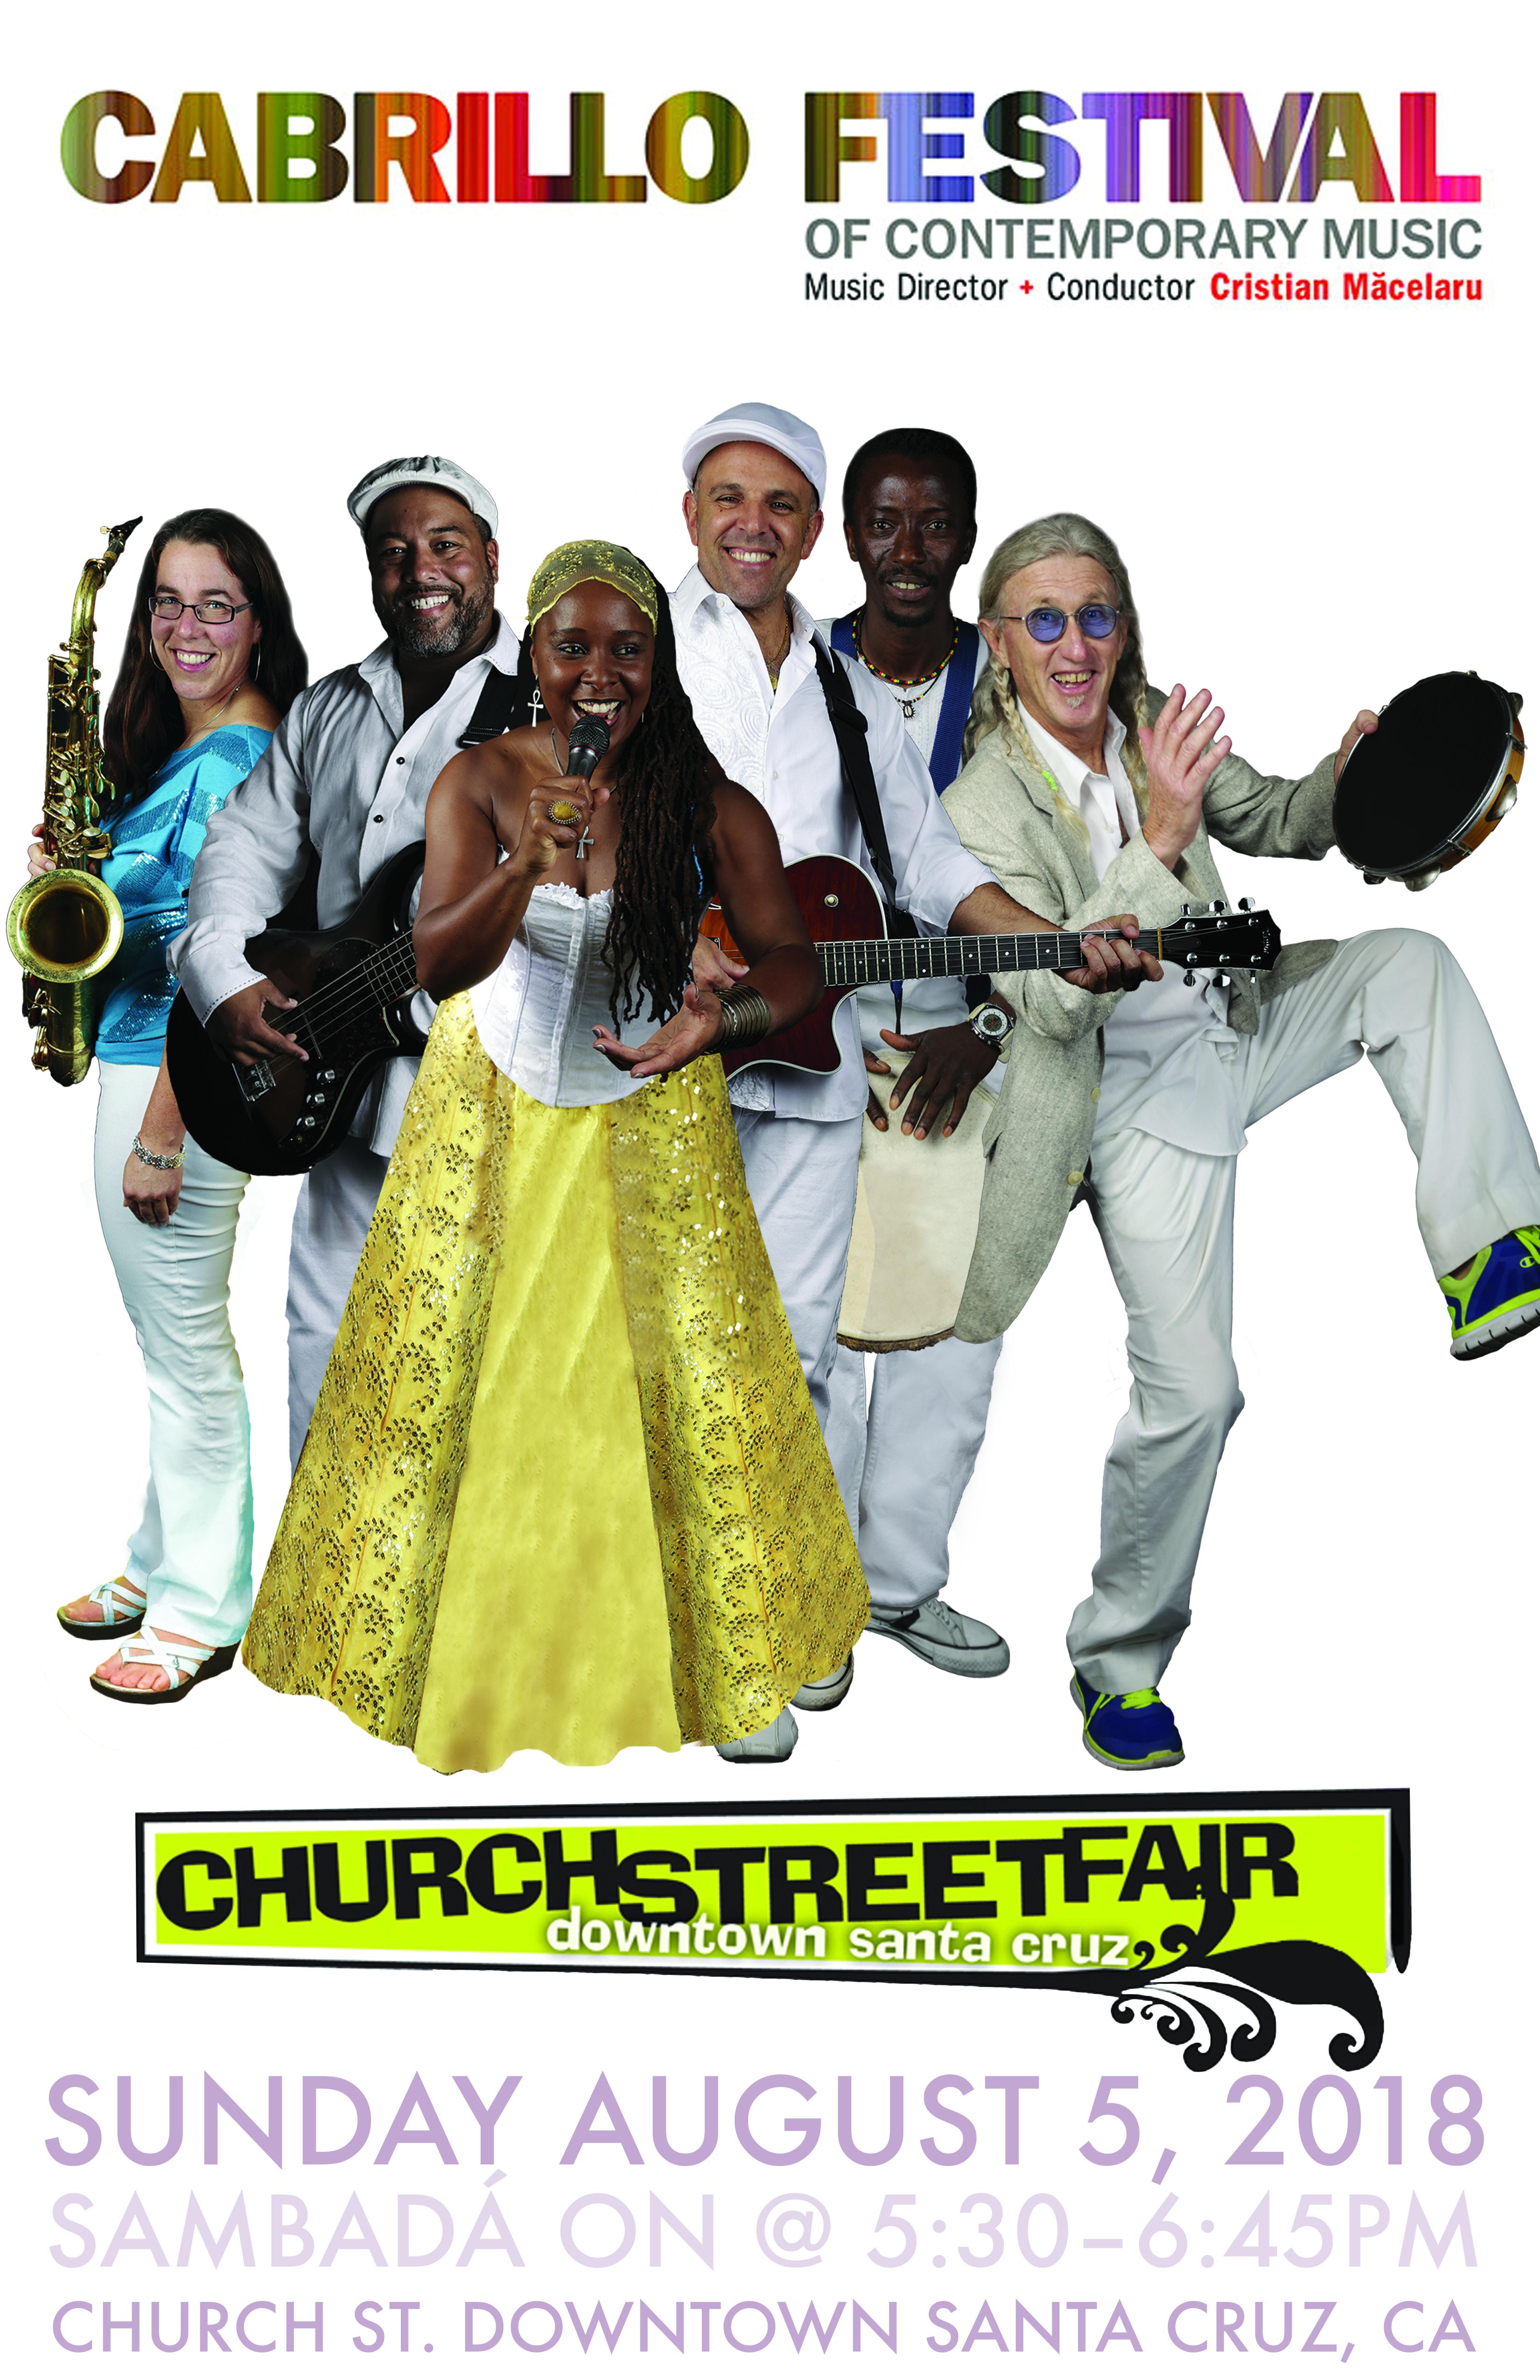 SUN.AUG.5 – CHURCH STREET FAIRE – SANTA CRUZ, CA